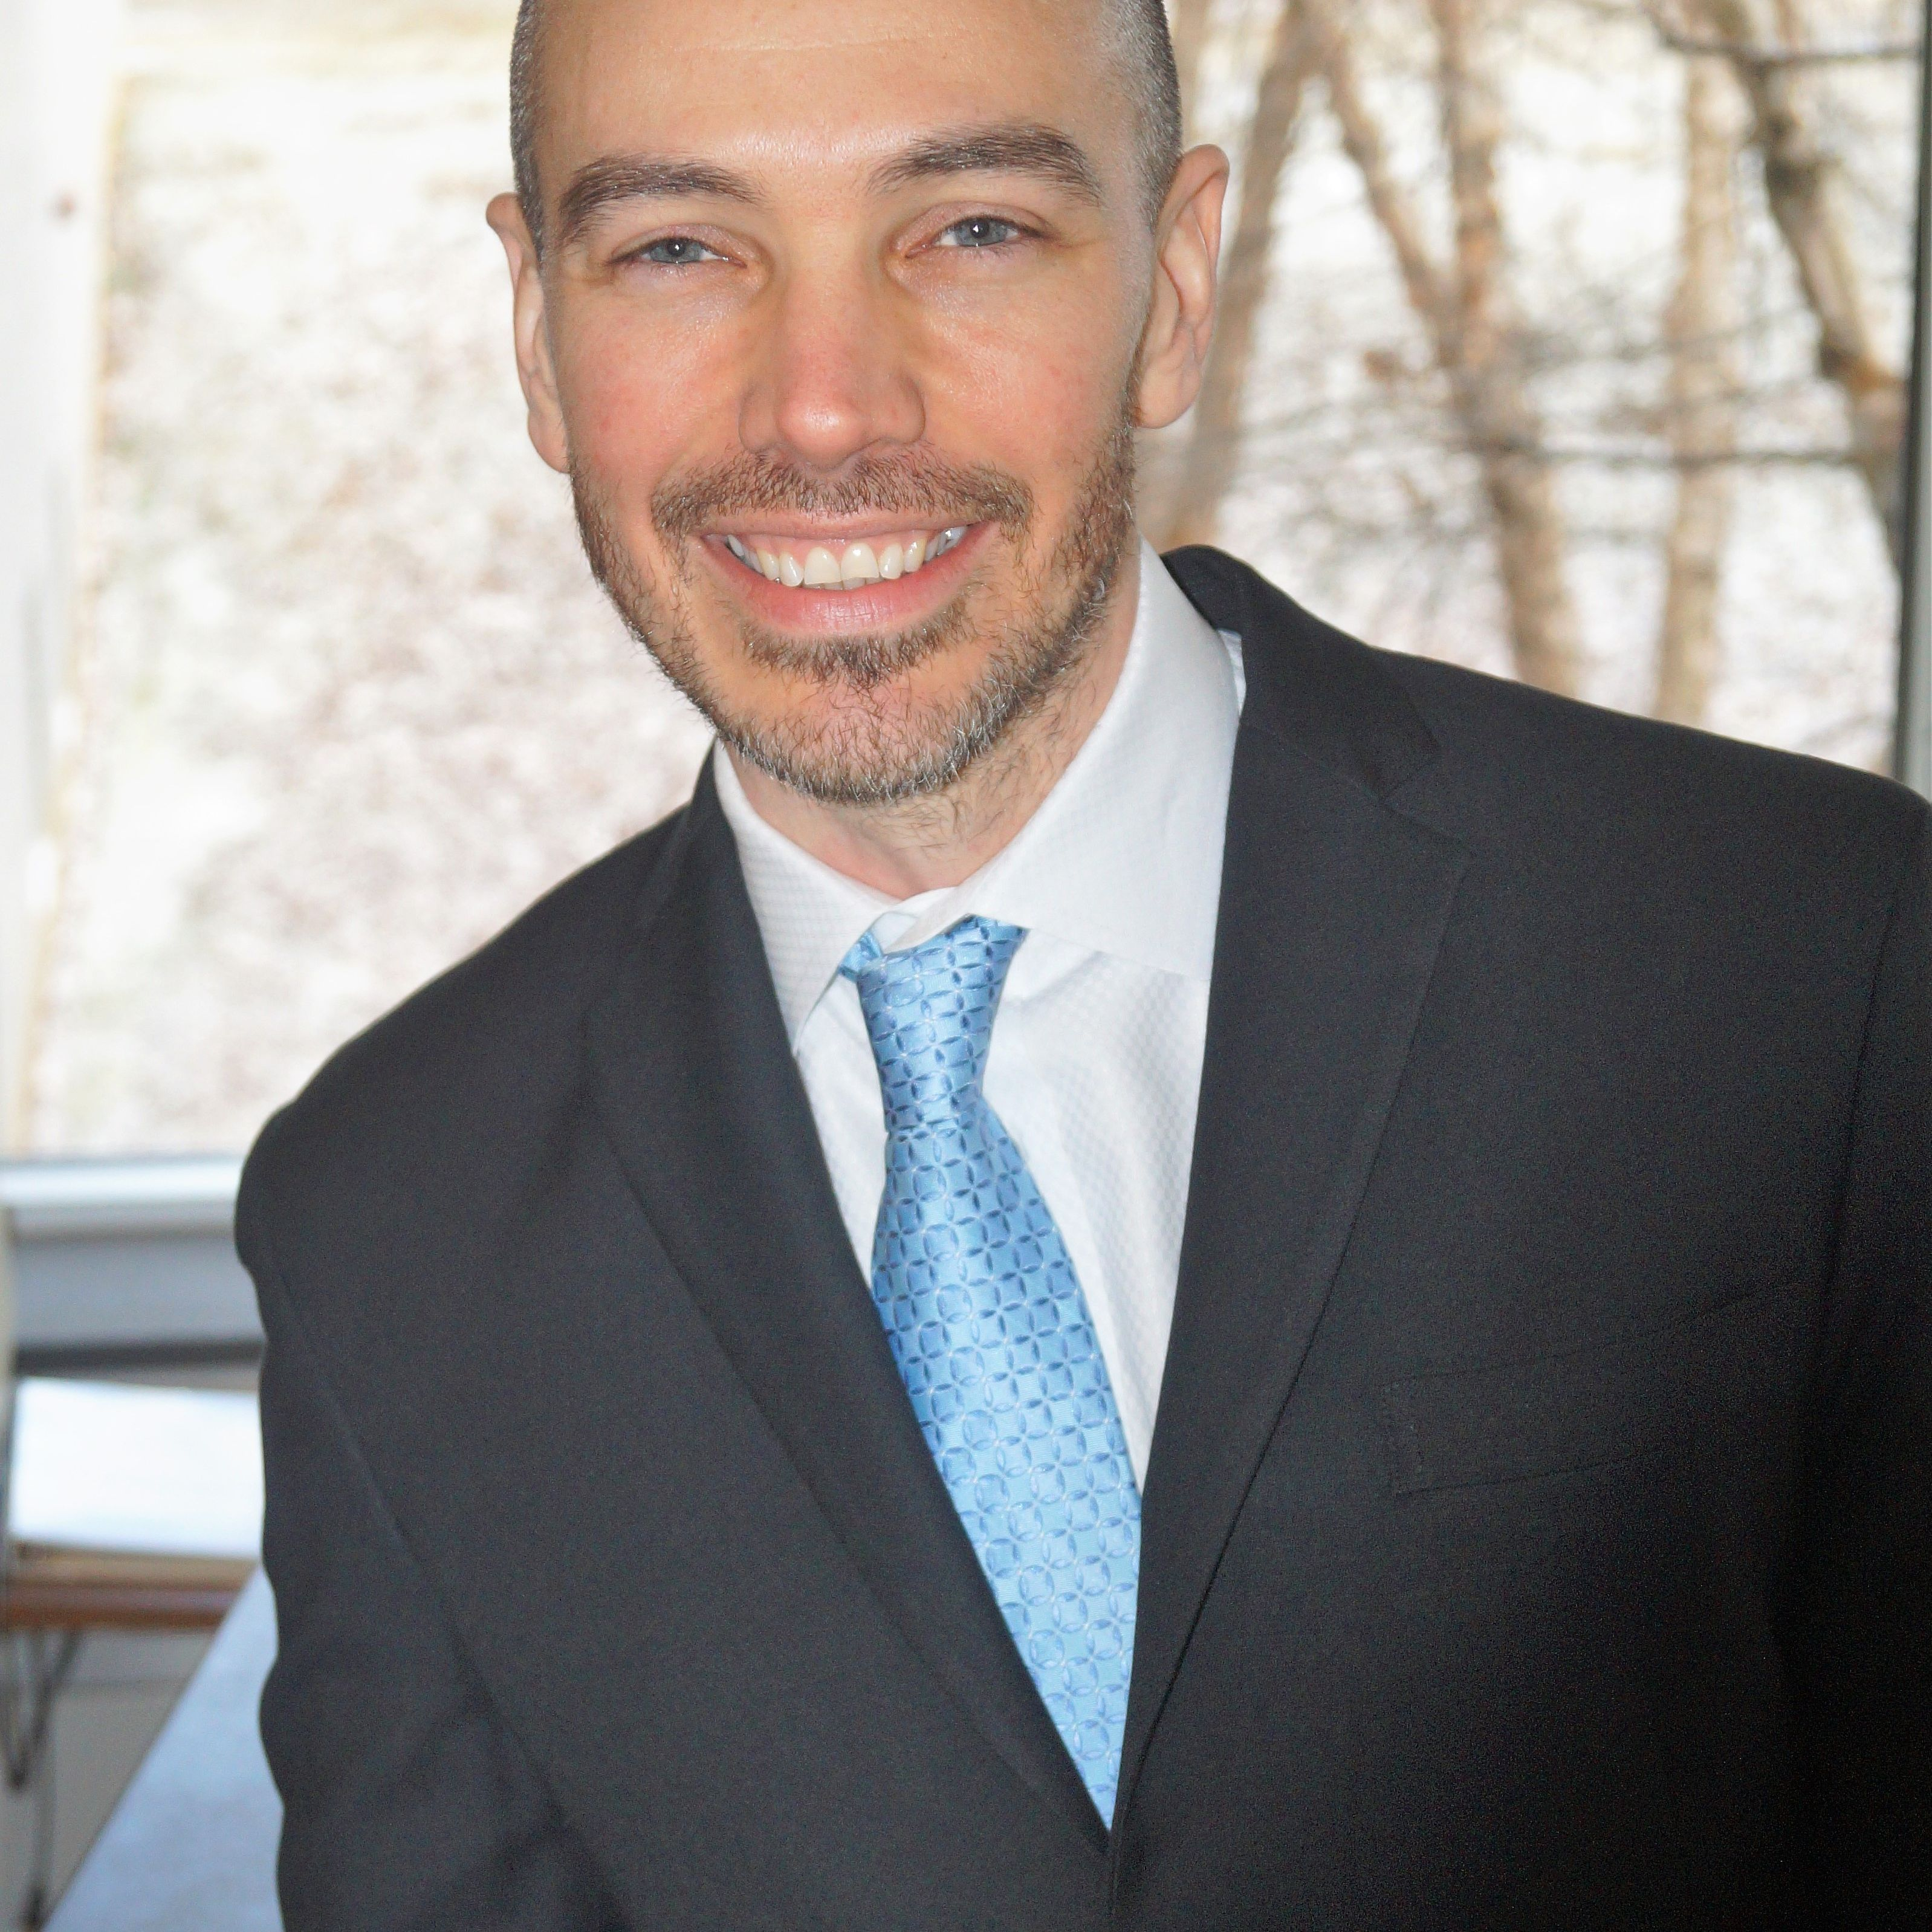 Joseph P. Yanchis